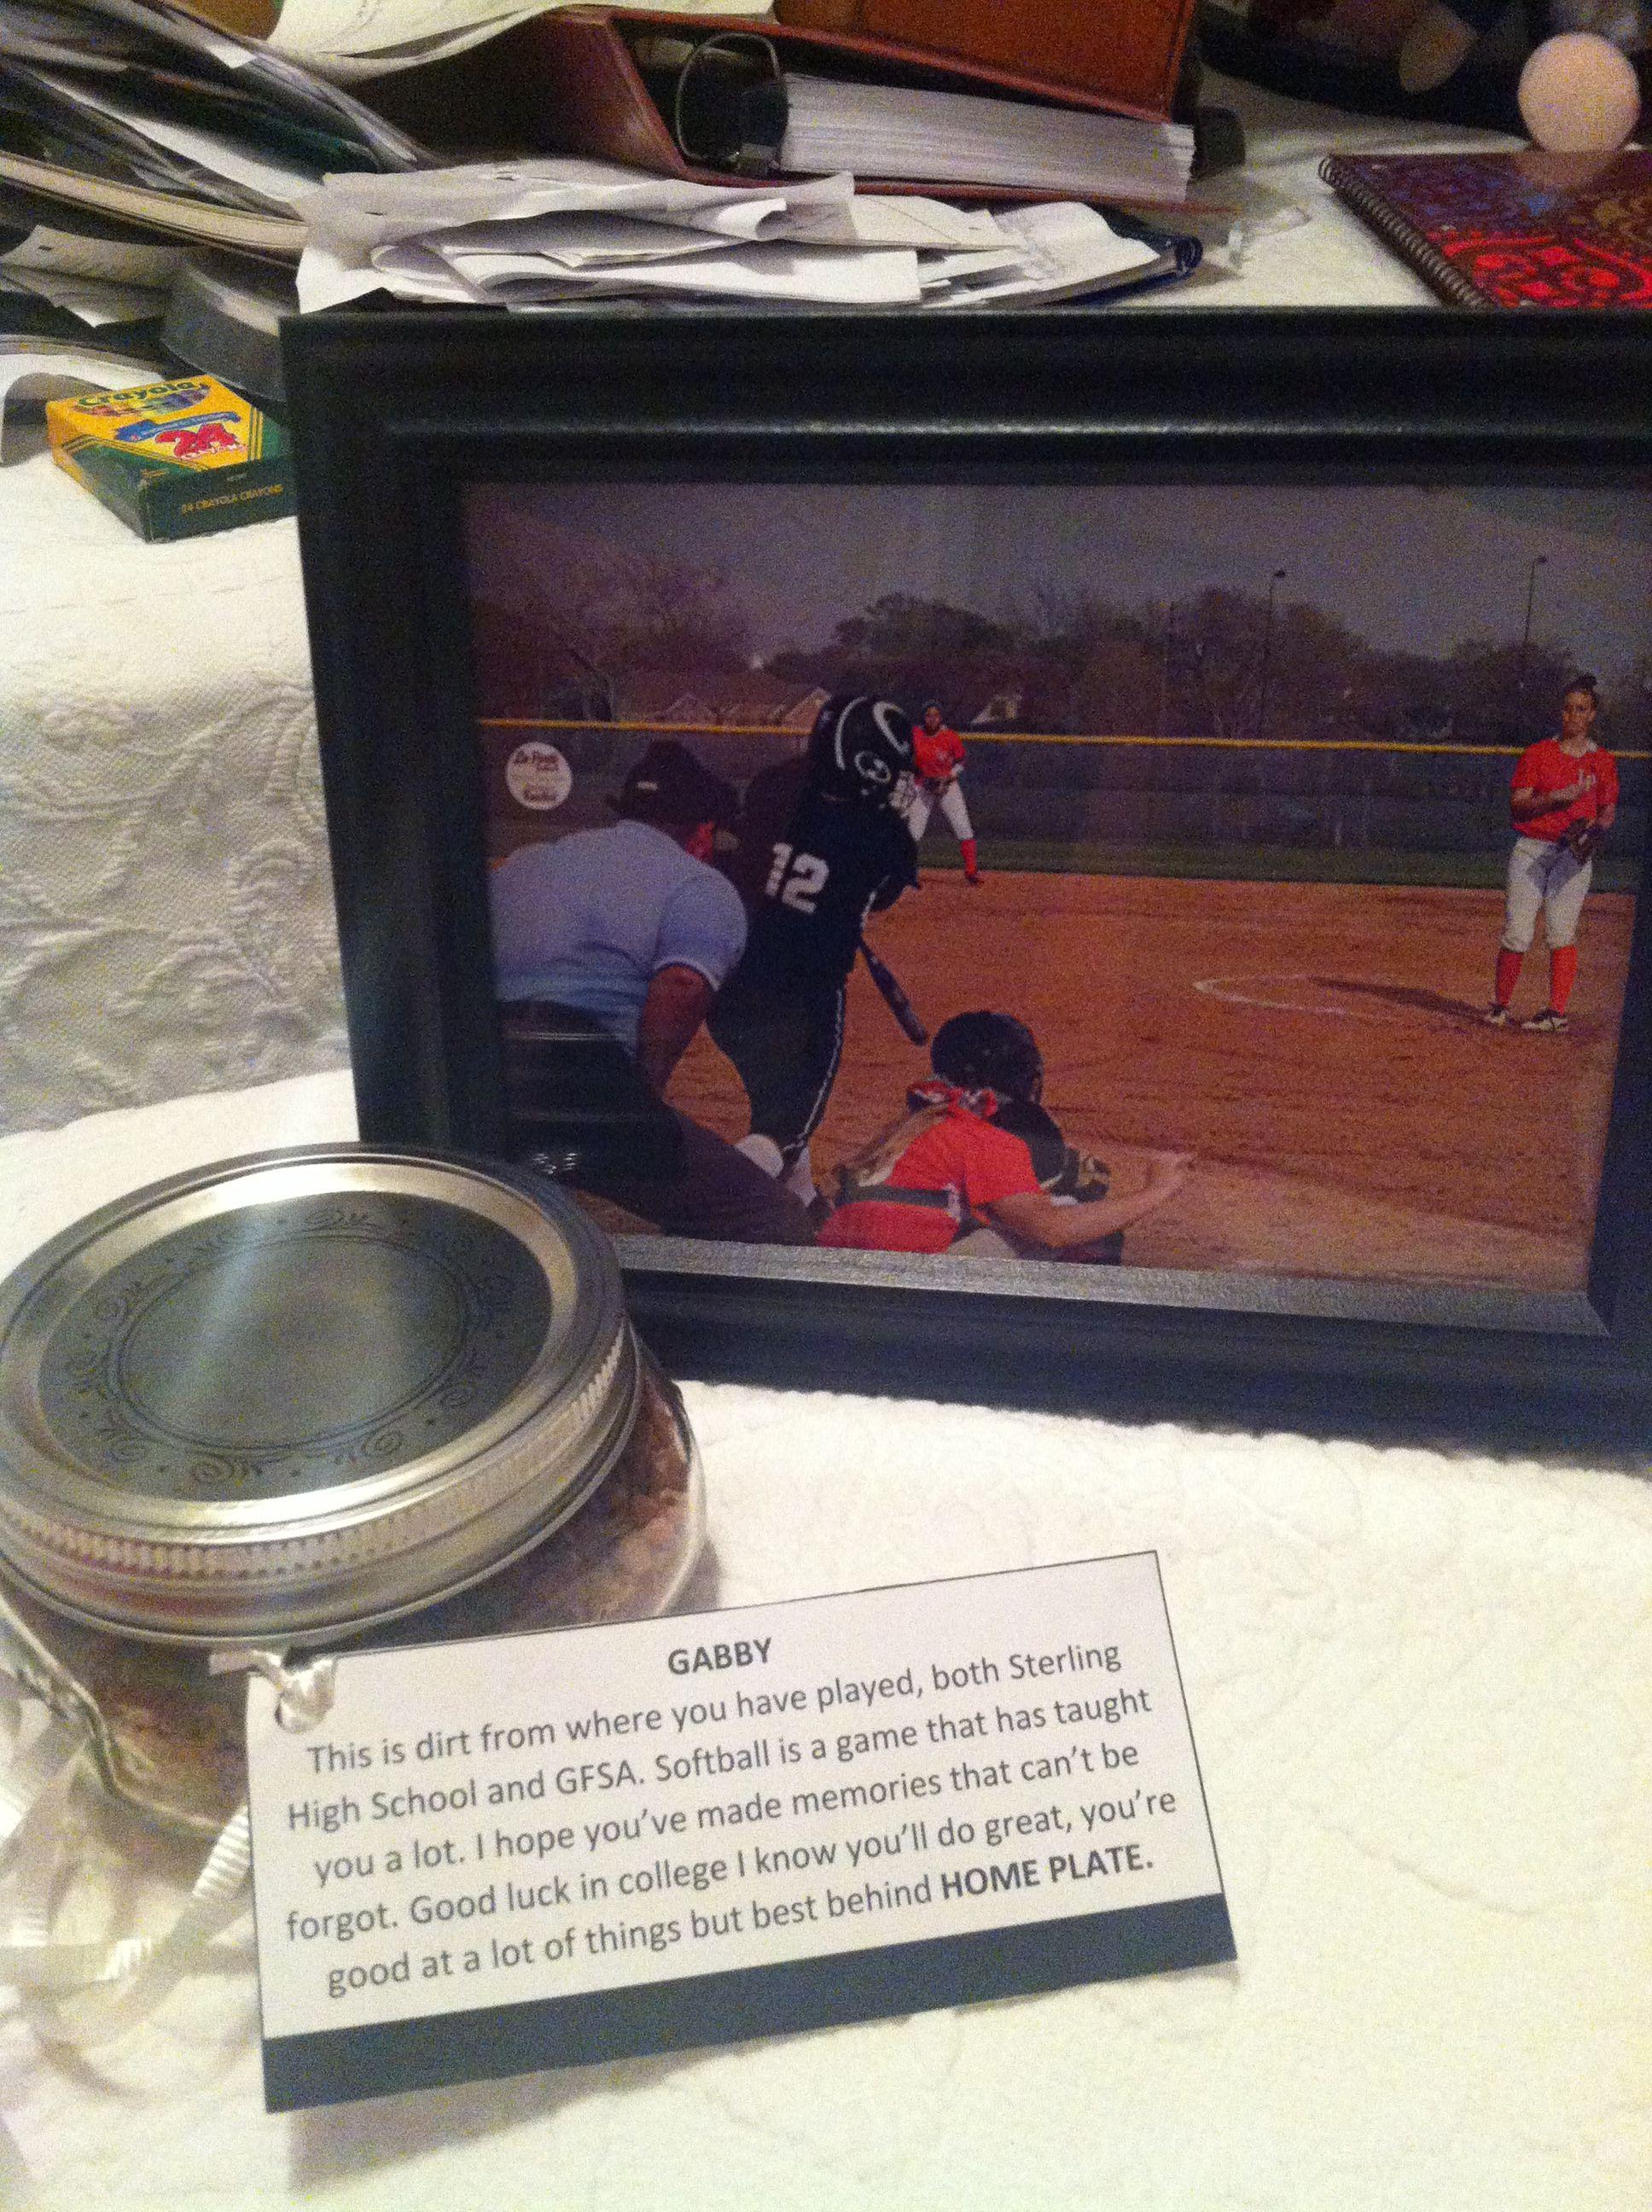 Senior Night Quotes For Softball: Softball Senior Night Gift! A Framed Action Shot And A Jar